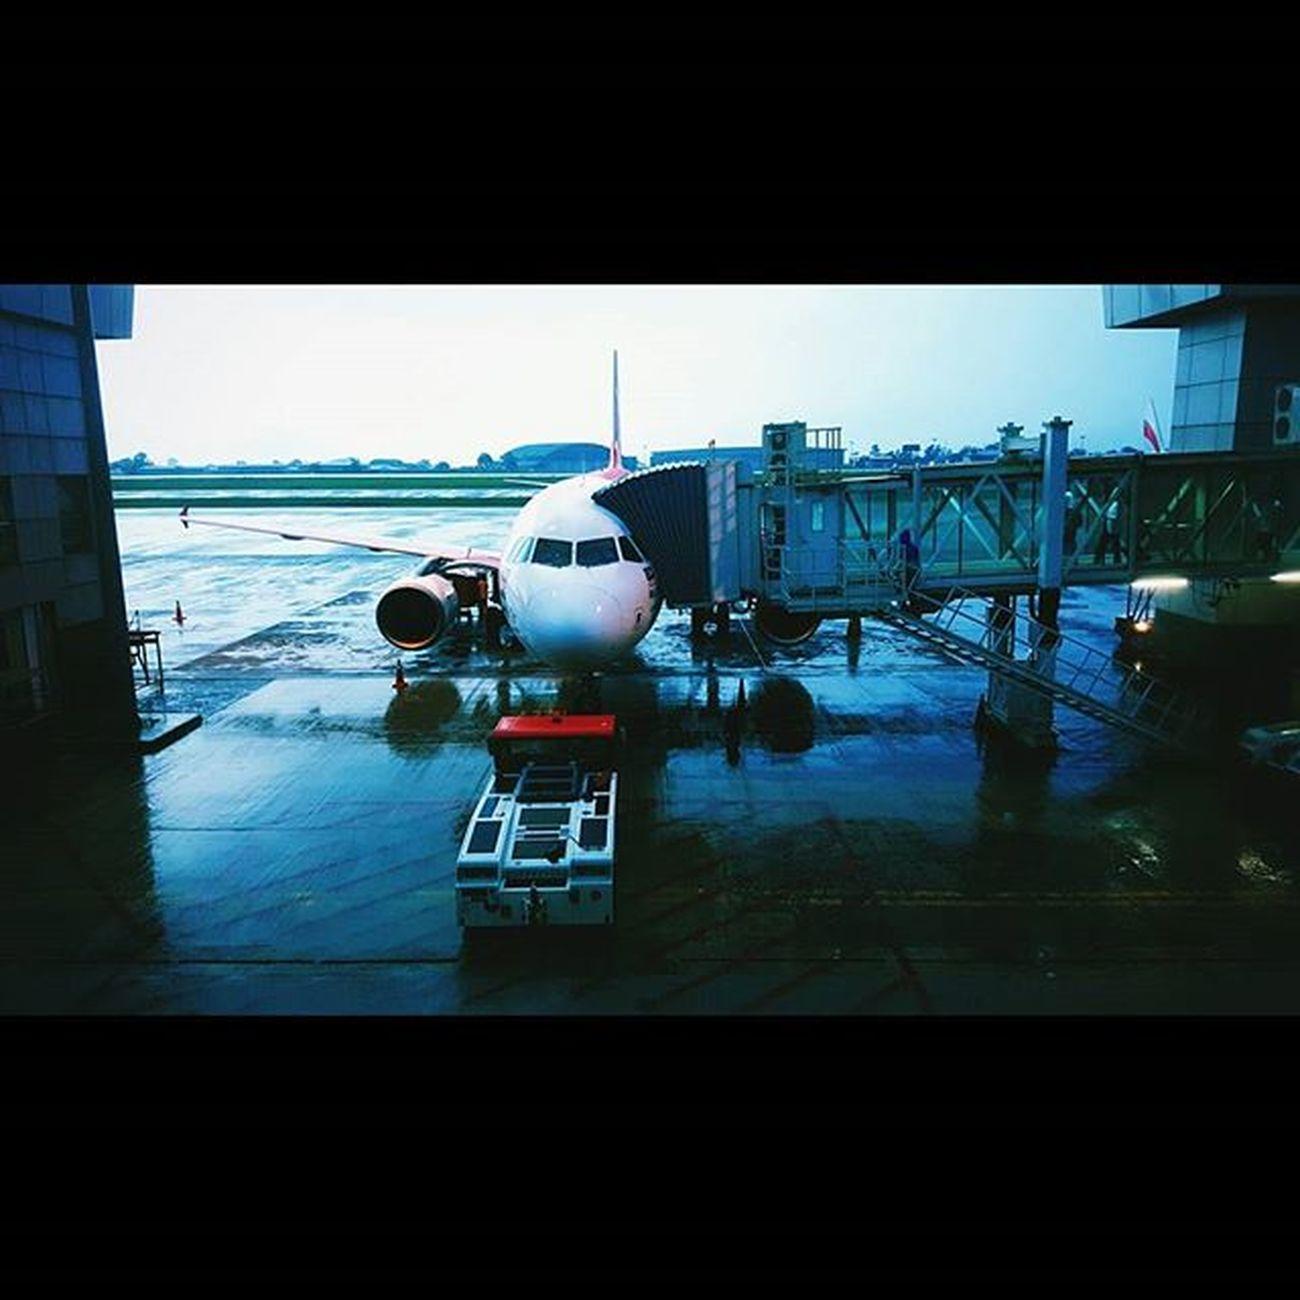 a l l o n b o a r d . . . Biakkch Tya714 Tyaeze Borneoboy Borneoislandproject Airasia Streettogether Igers Igersxmalaya Igersone Igersmalaysia Instagram @igersmalaysia @igersxmalaya @instagram